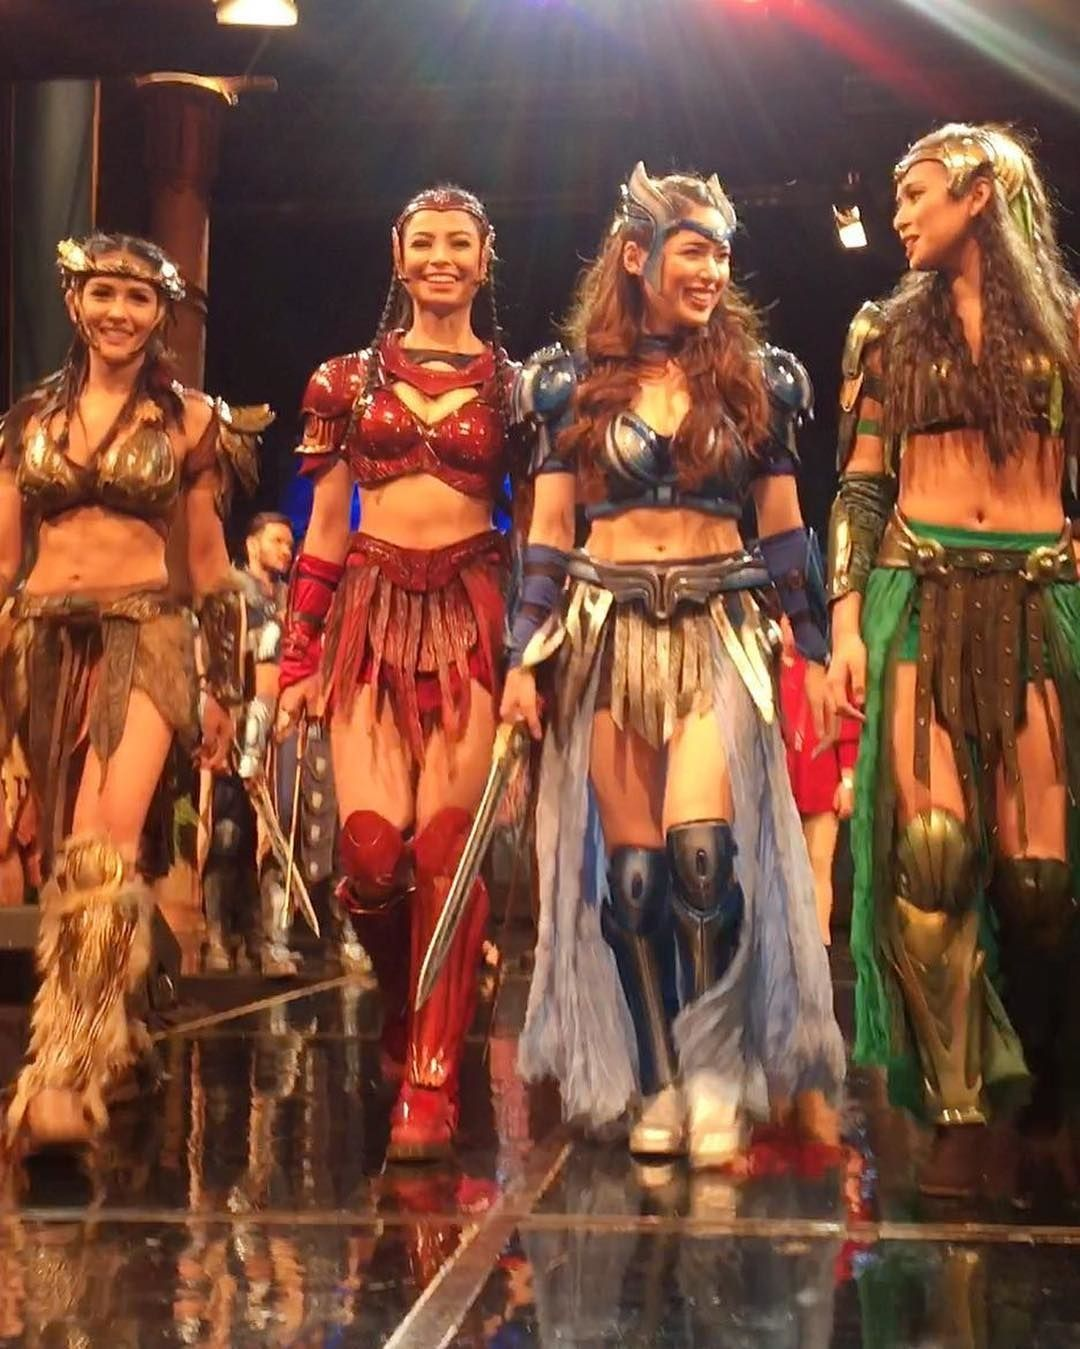 Instagram Photo By Sonia Francisca Moura Jul 14 2016 At 9 49am Utc Encantadia 2016 Costume Character Costumes Kylie Padilla